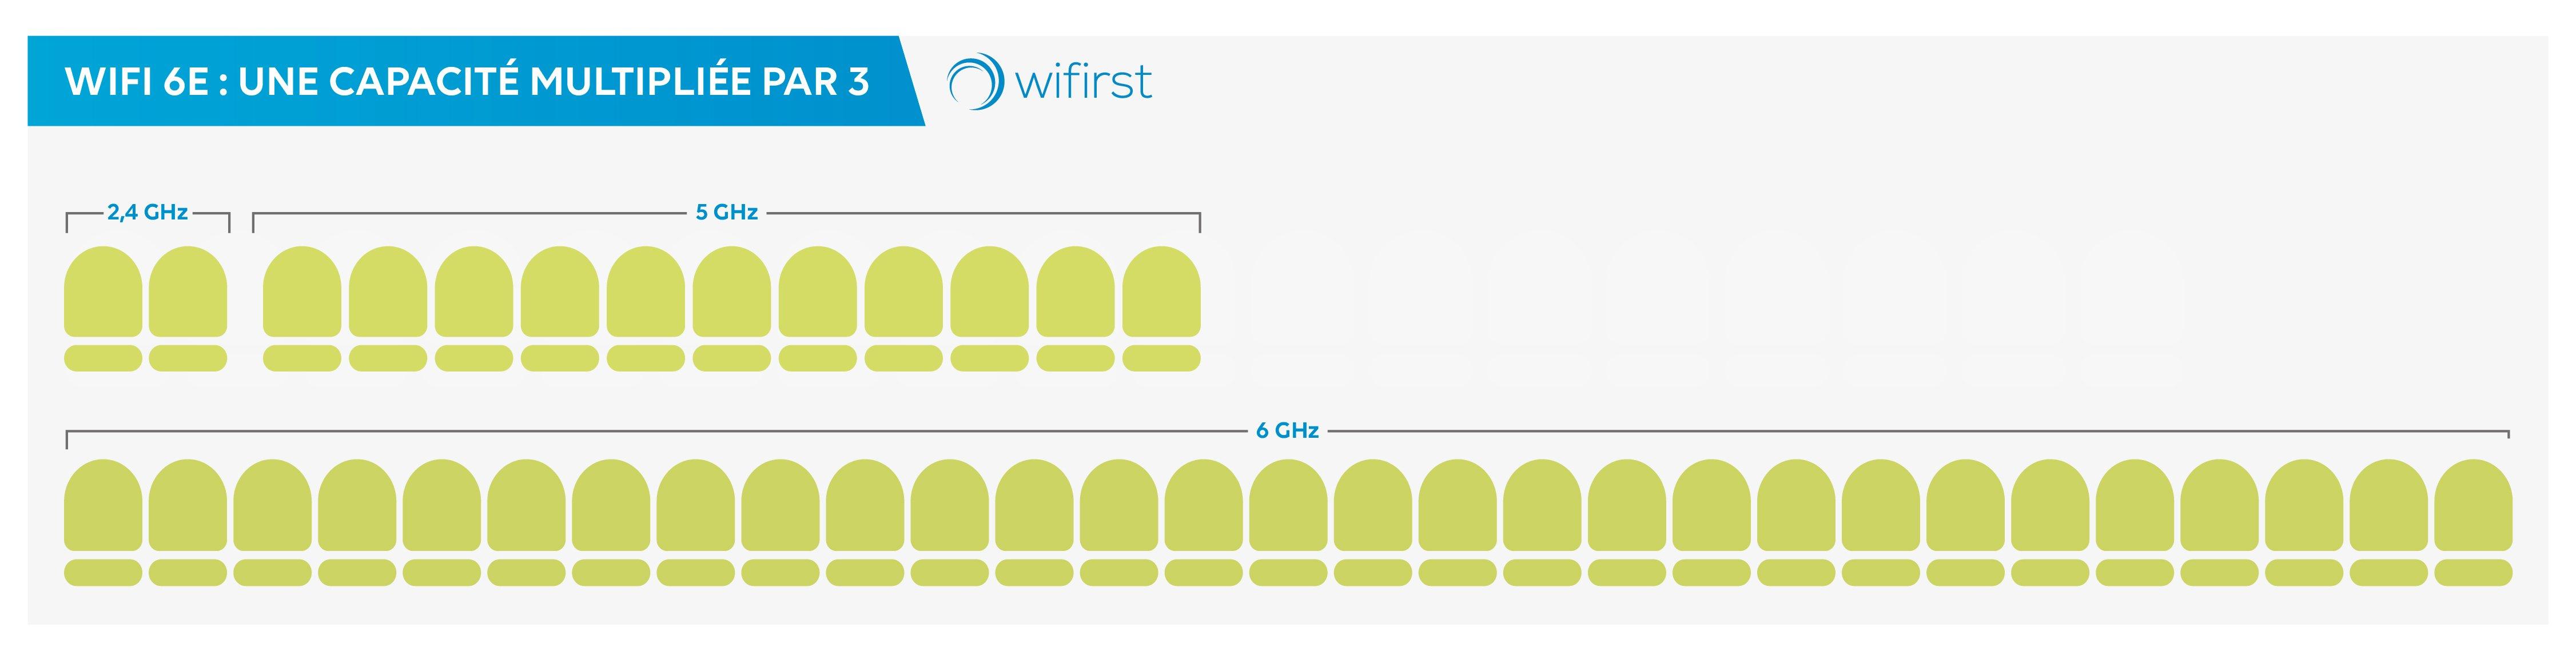 Capacités WiFi 6E